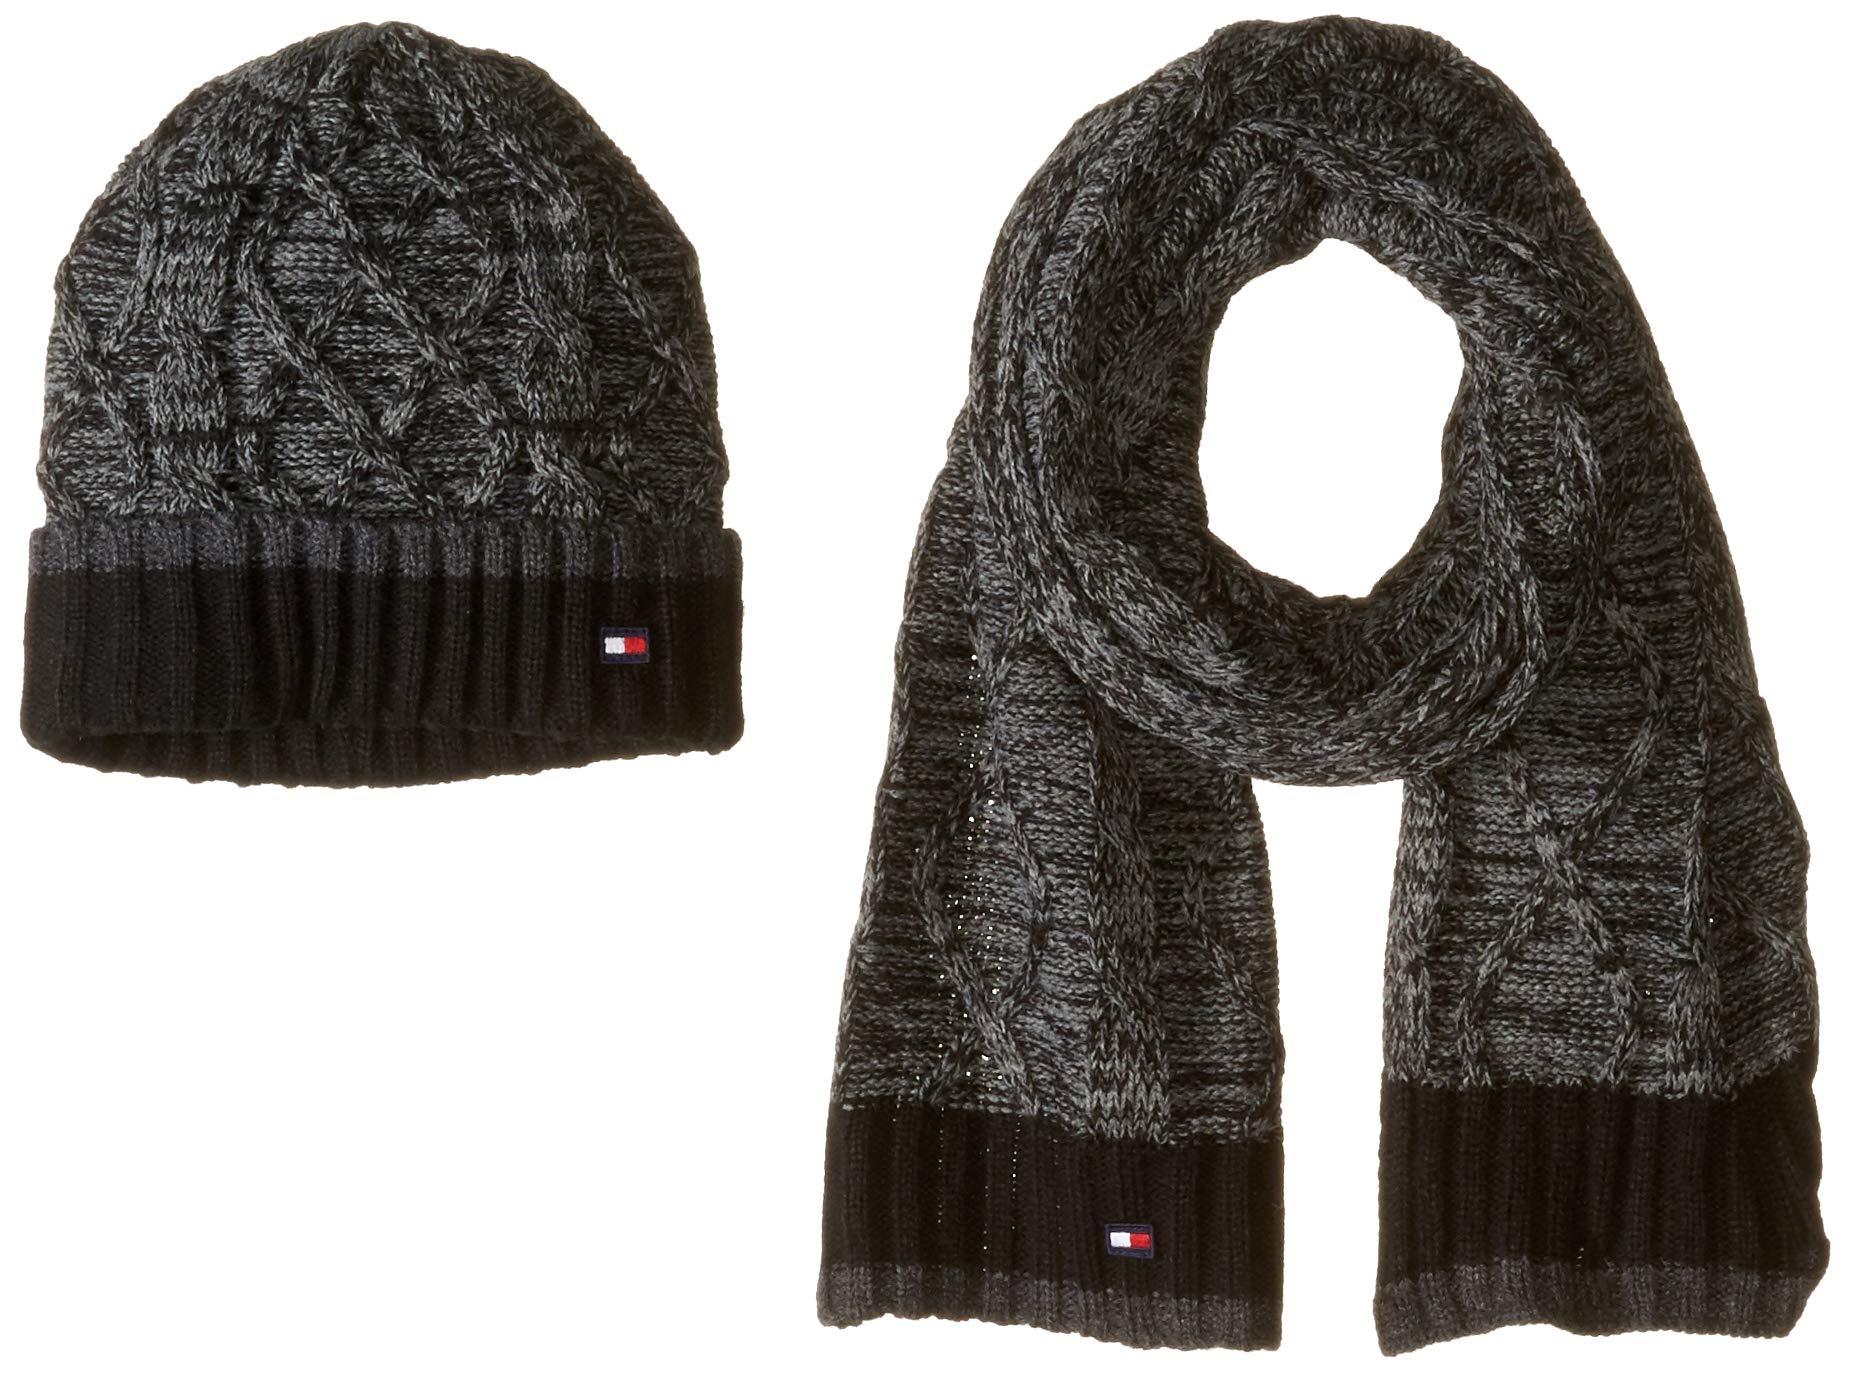 Tommy Hilfiger Men's Hat and Scarf Set, Deep Black, One Size